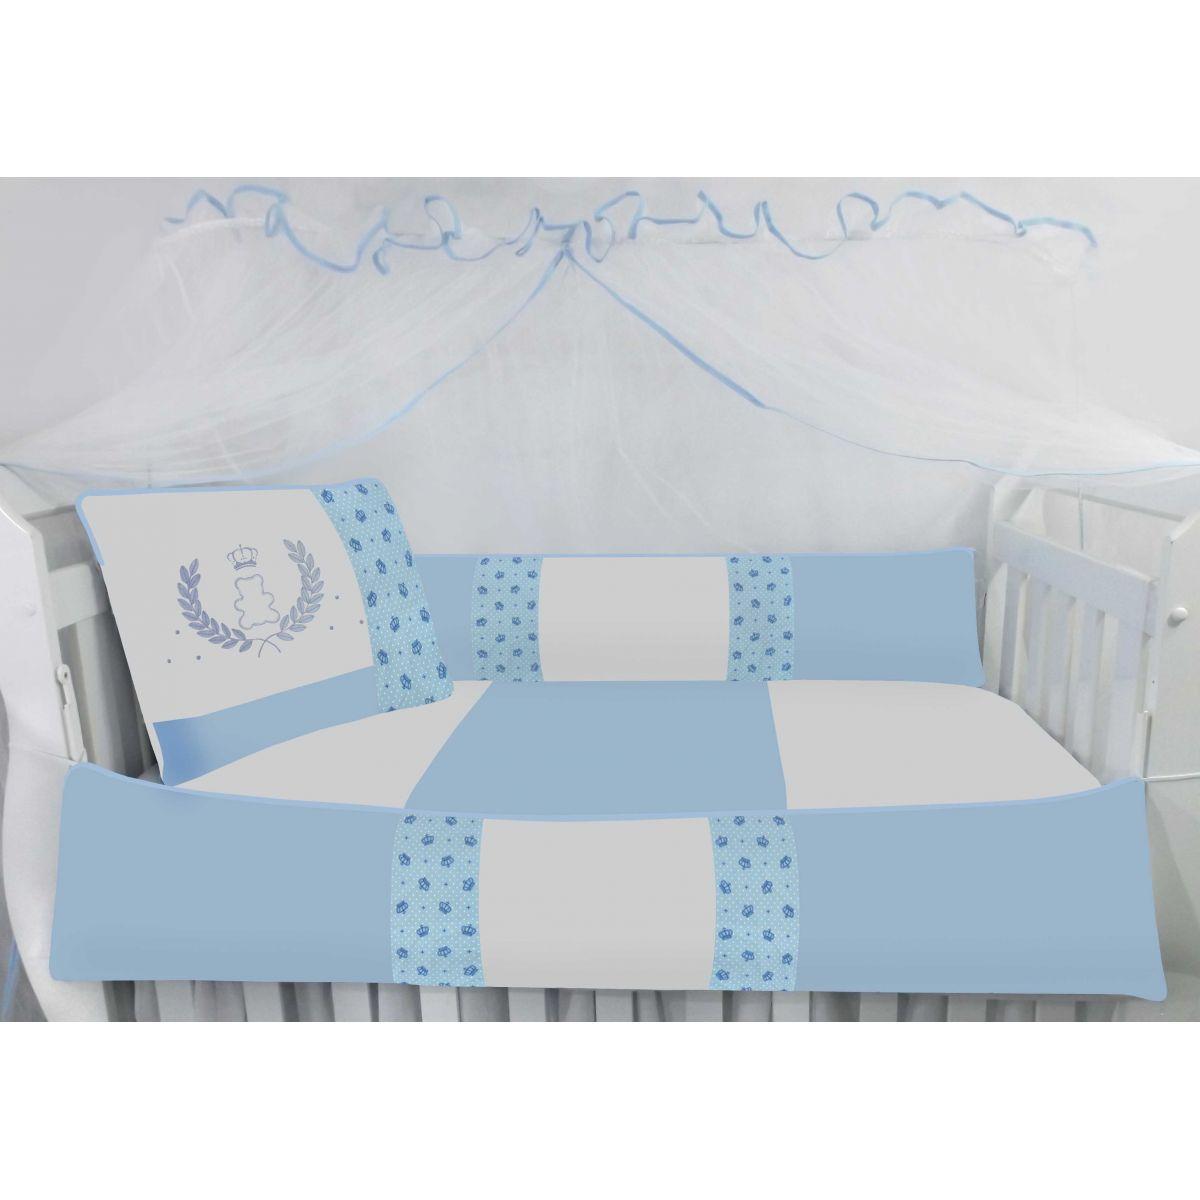 Kit Berço Baby 9 peças - Urso Coroa Azul